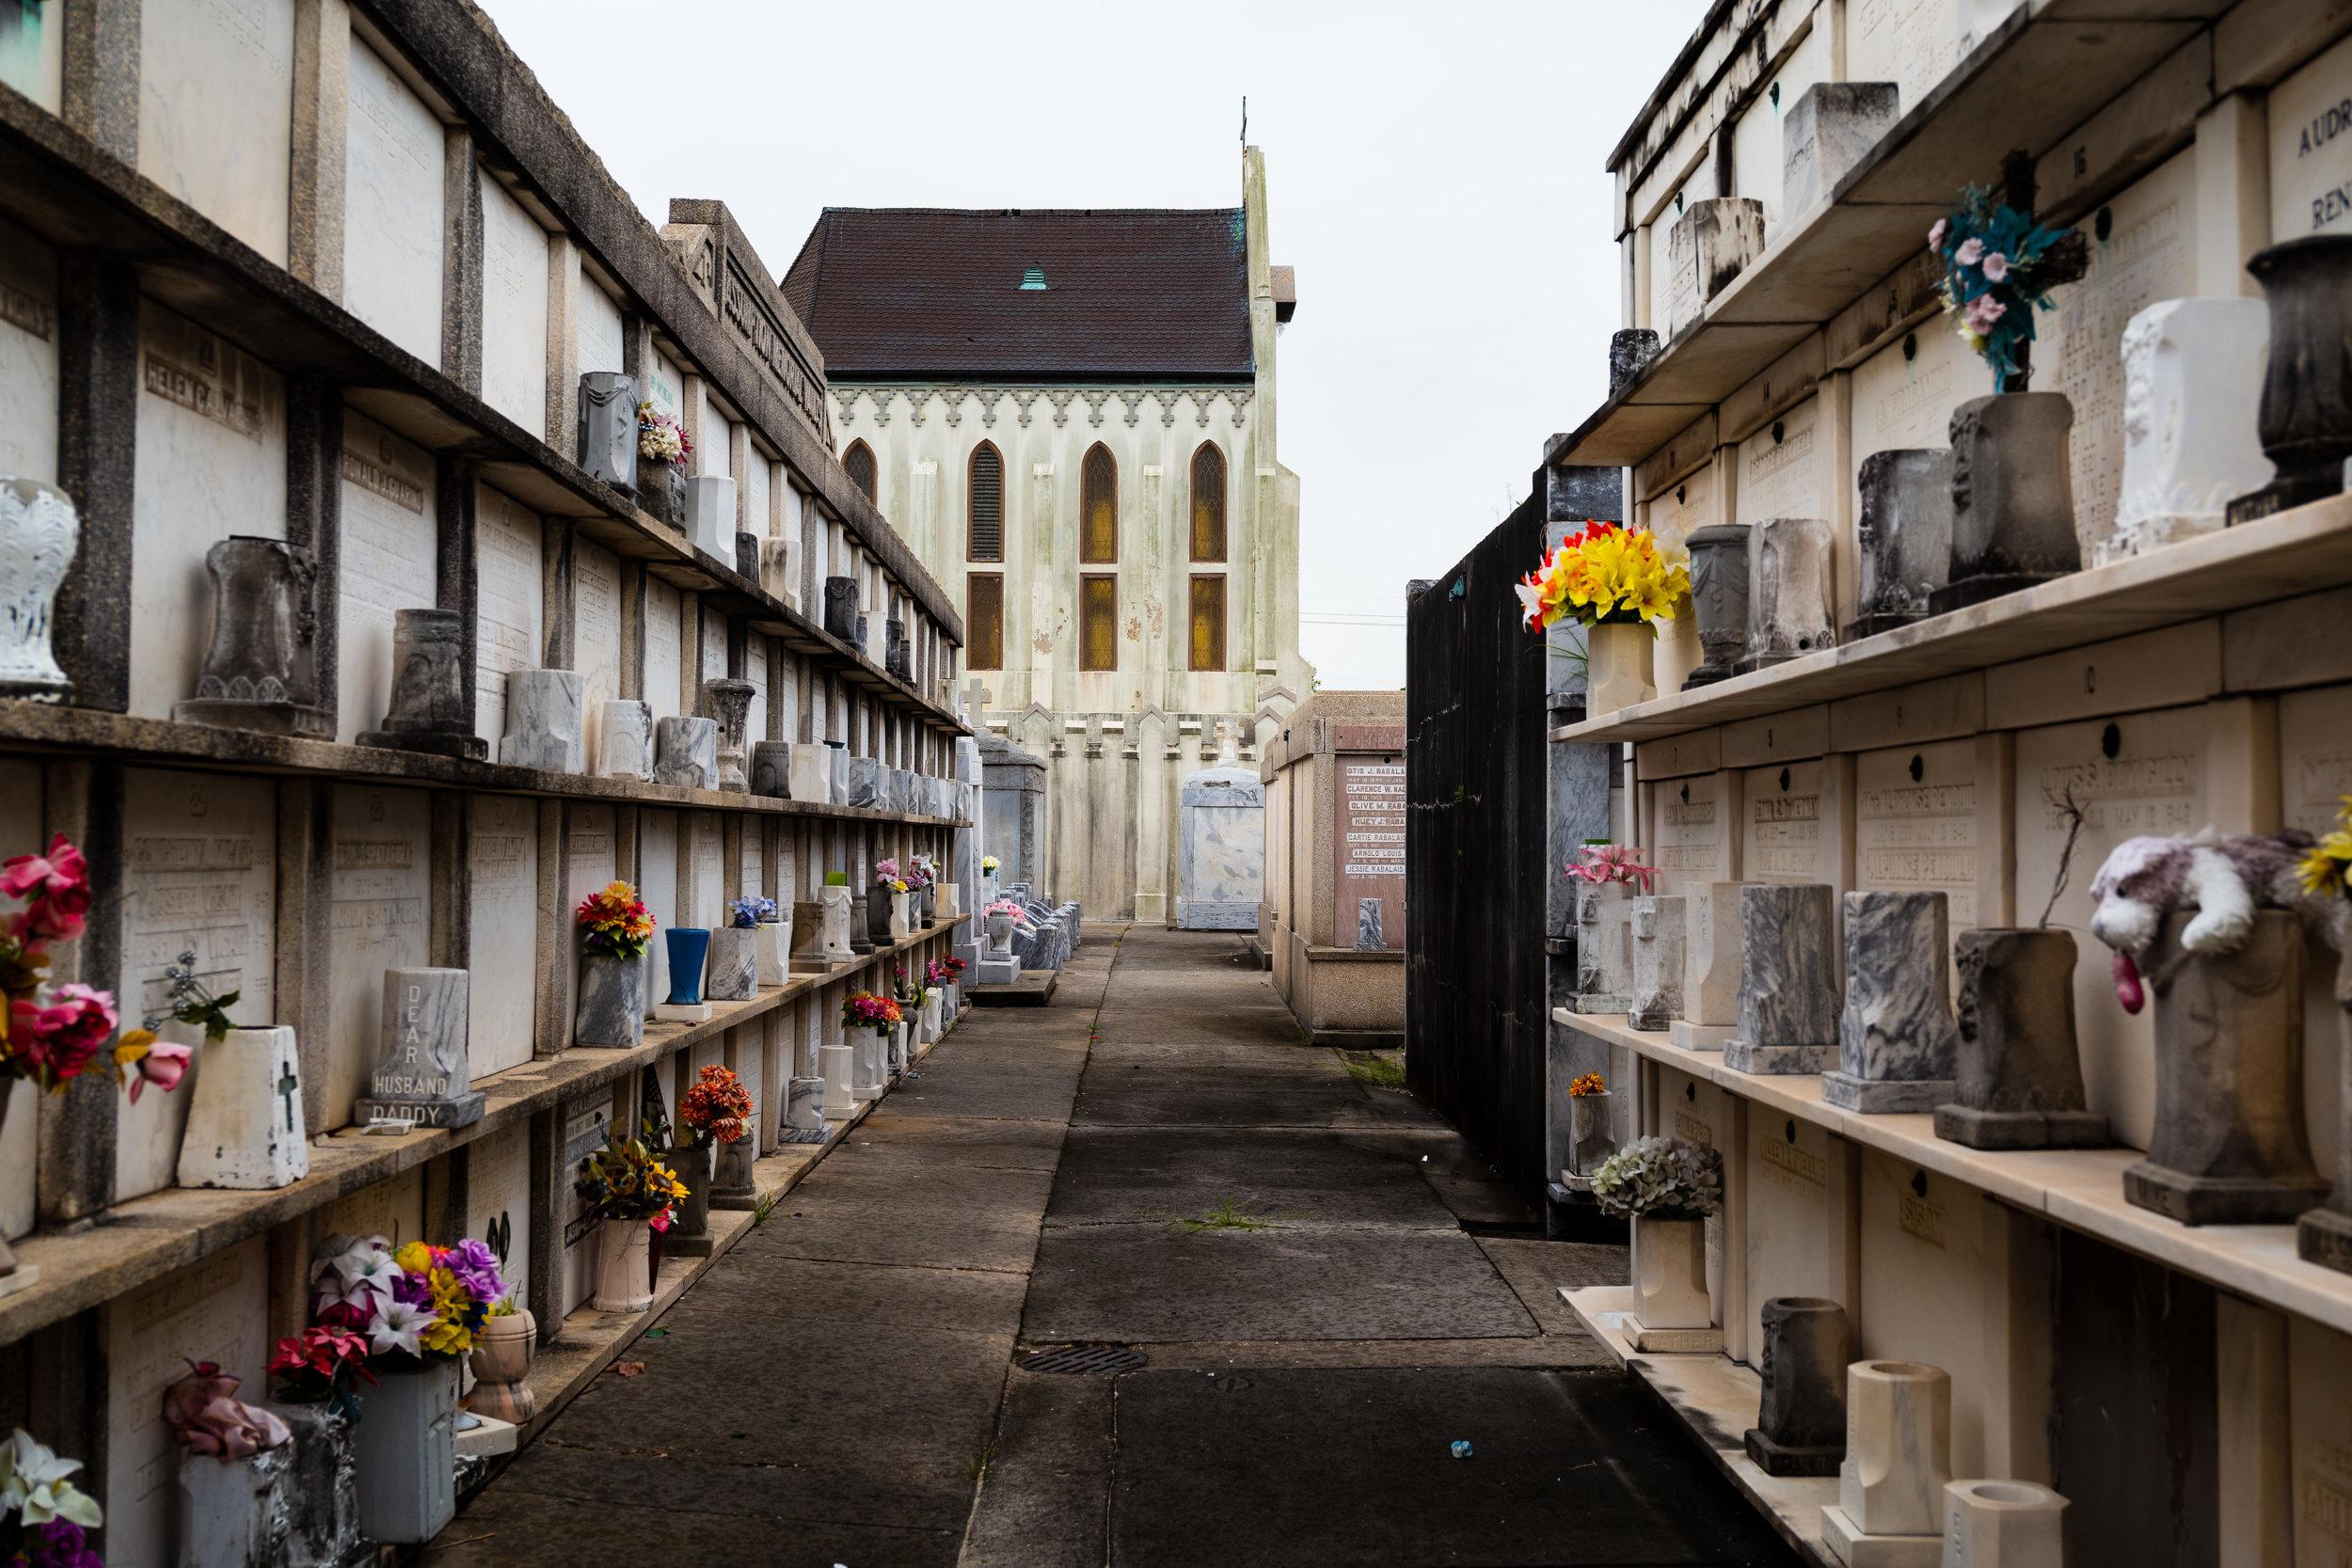 A Travacurio Guide: - exploring new orlean's historic cemeteries